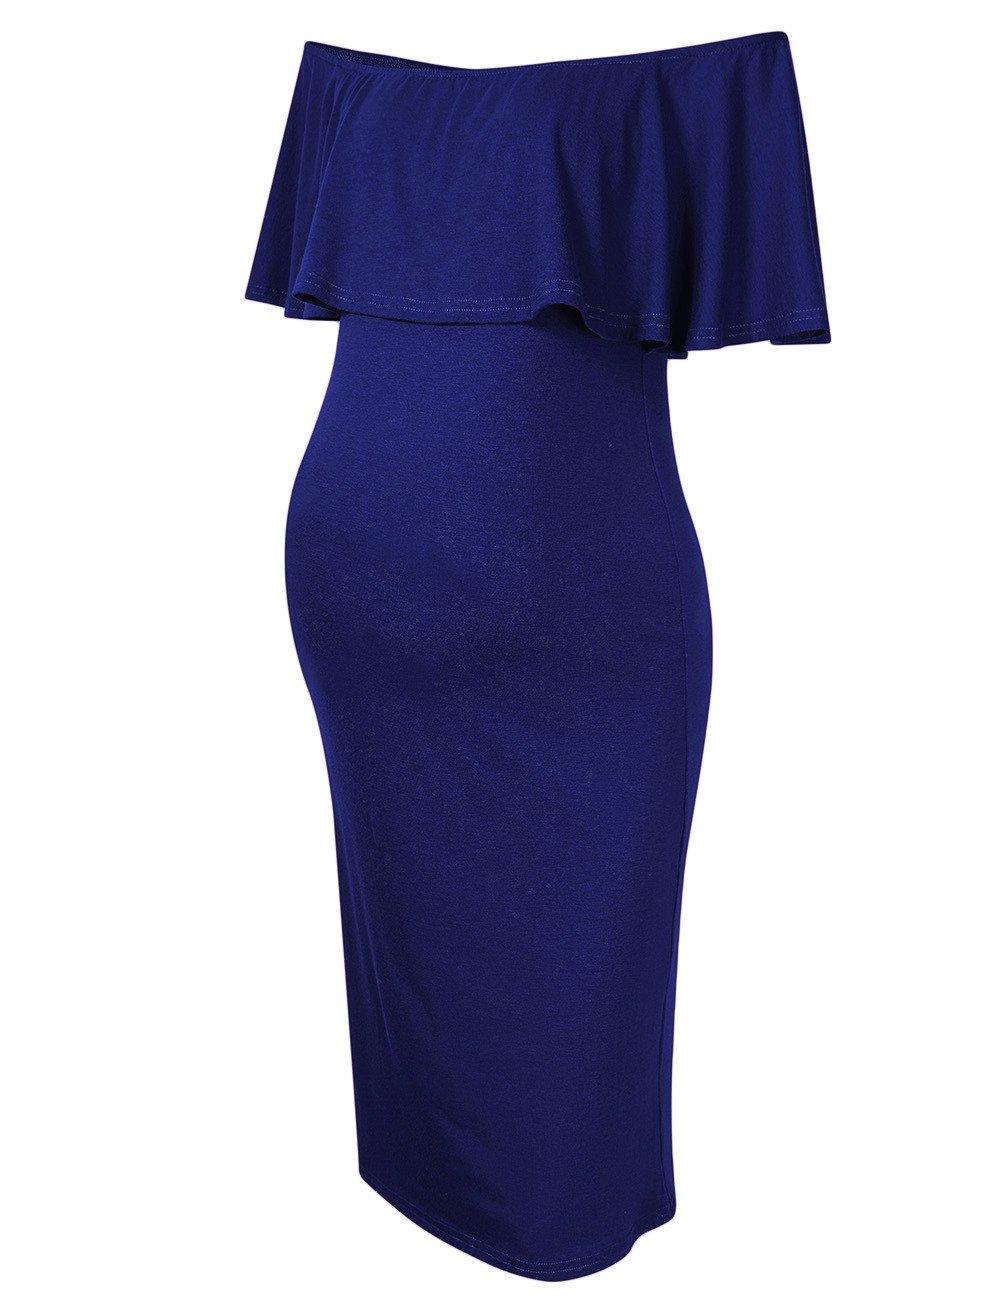 MissQee Maternity Dress MaternityMaxiDresses ForWomen (M, Navy Blue)